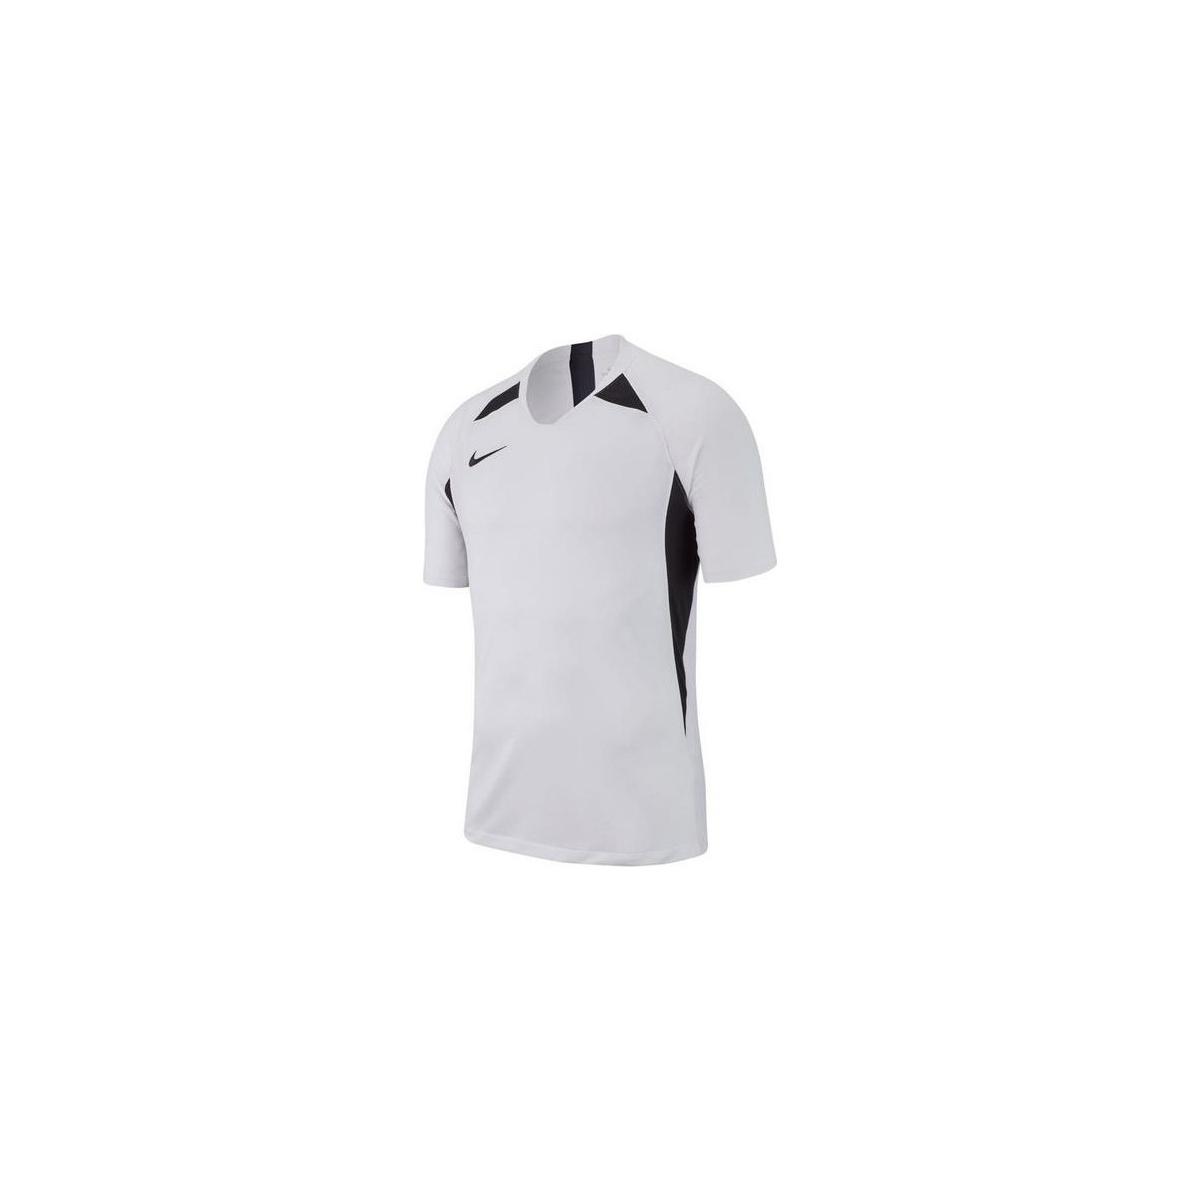 Dri-Fit Legend Erkek Beyaz Forma (AJ0998-100)